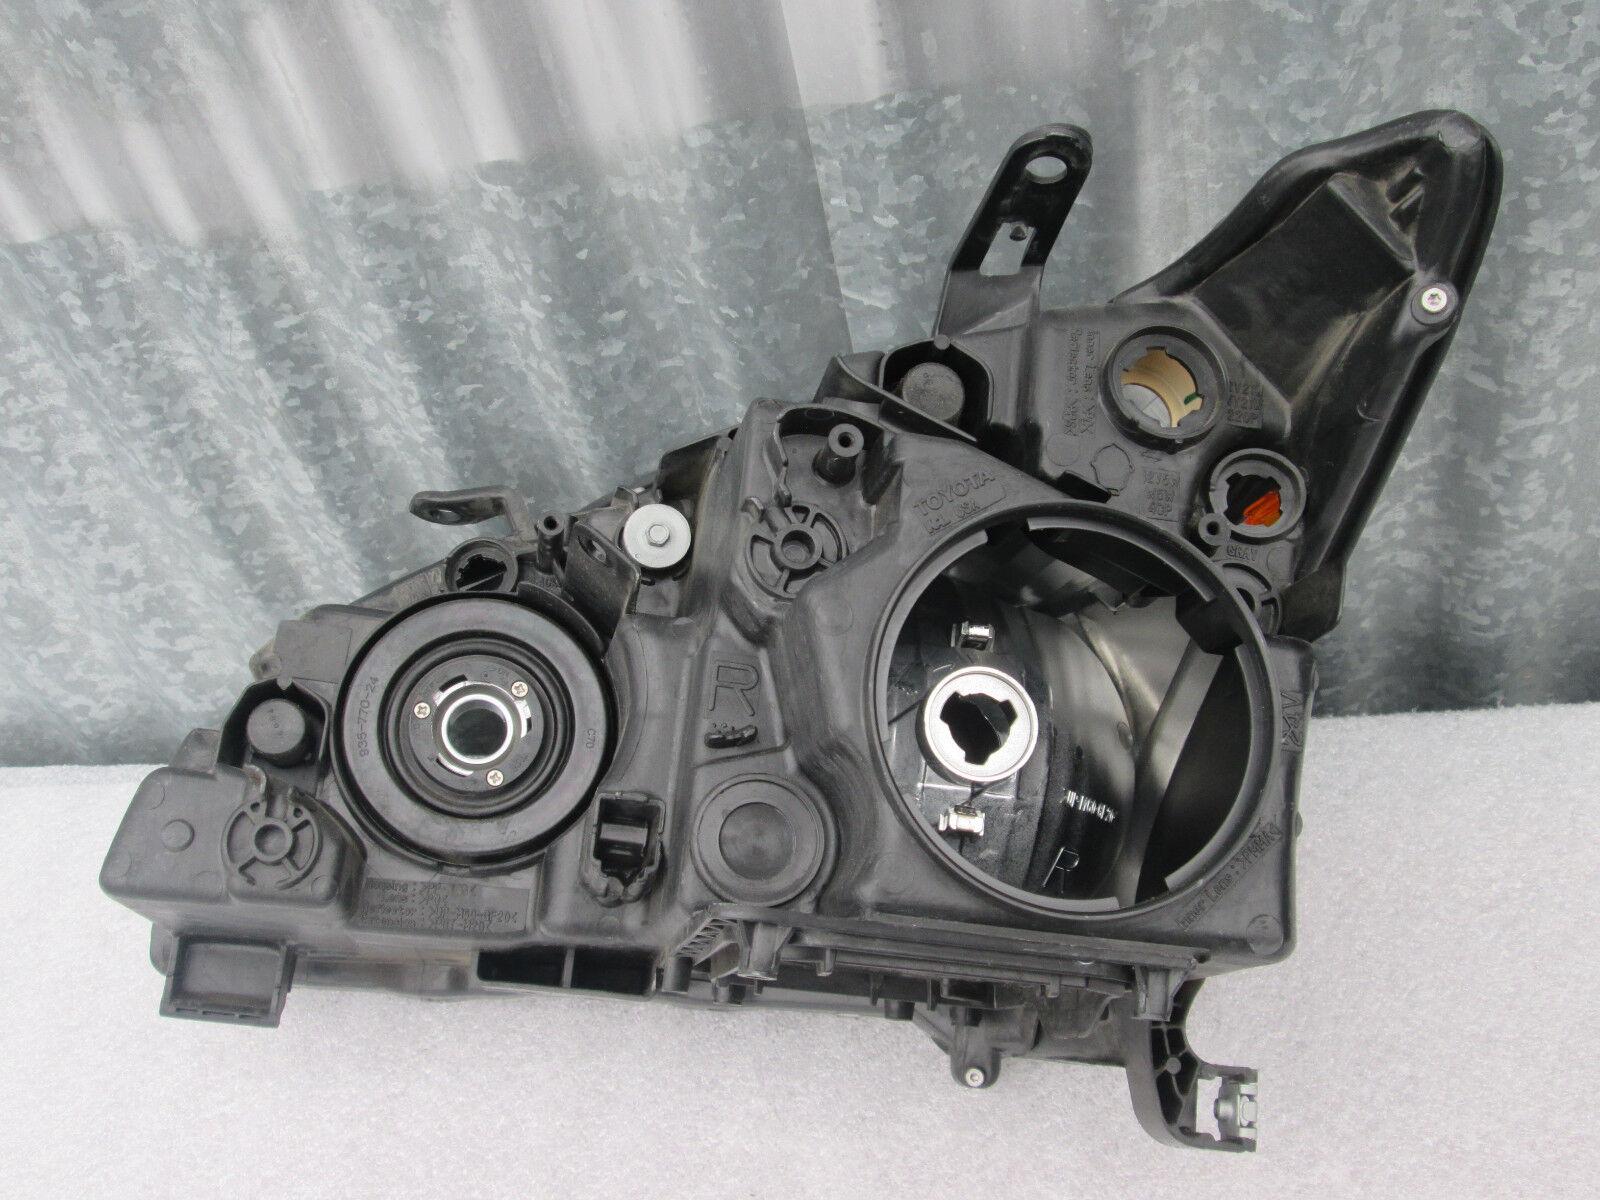 Used 2008 Lexus RX350 Headlights for Sale